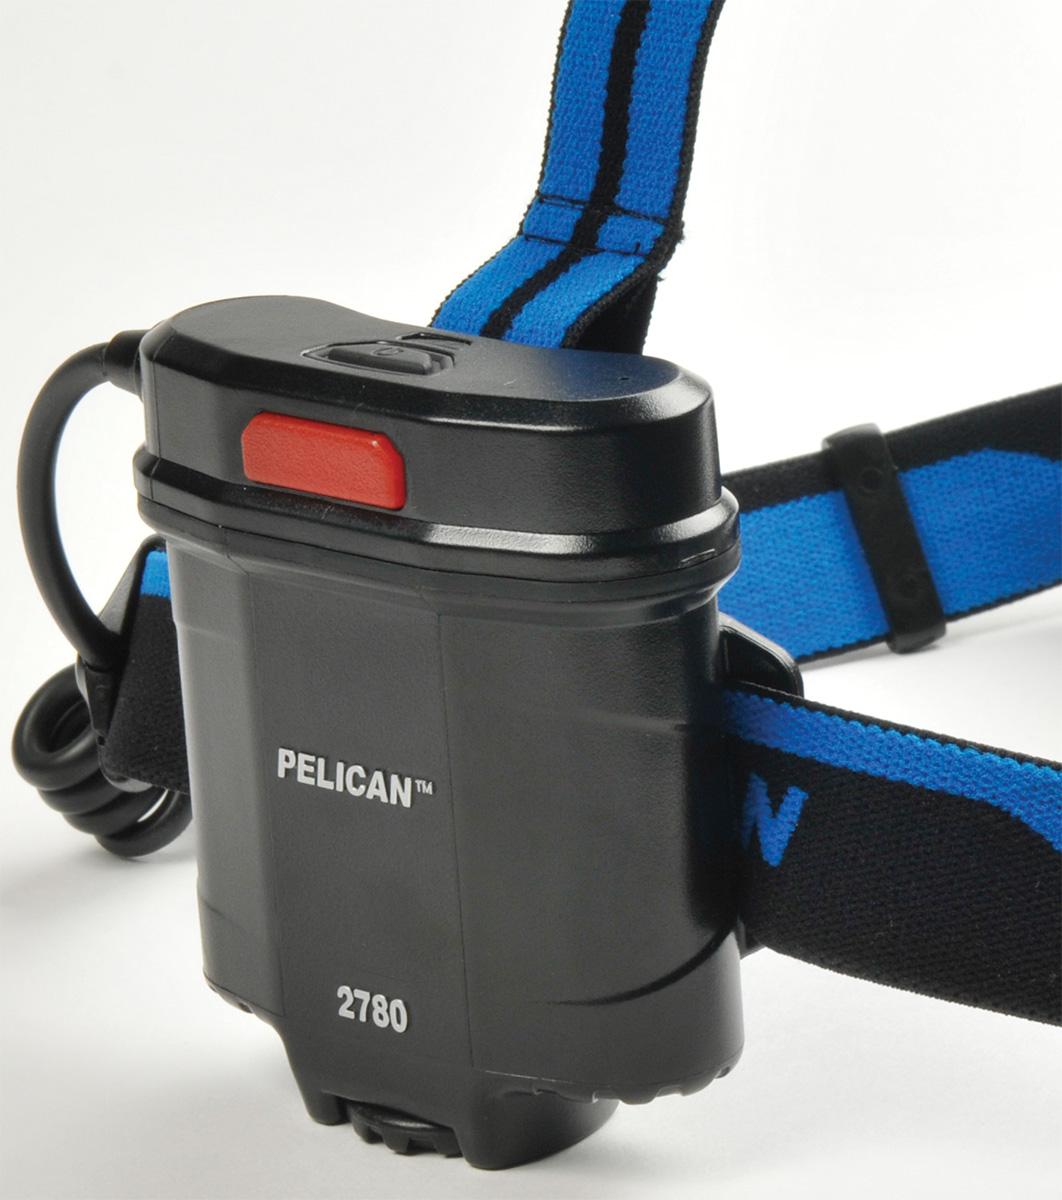 pelican 2780 battery pack led headlamp